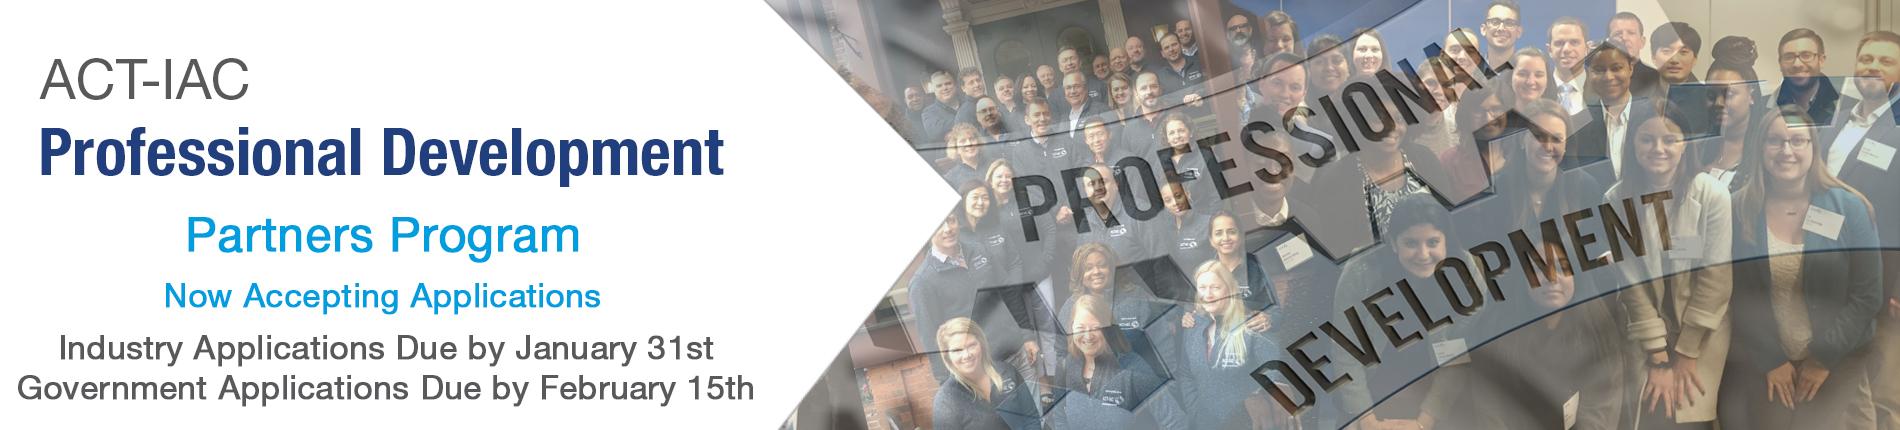 ACT-IAC Partners Program